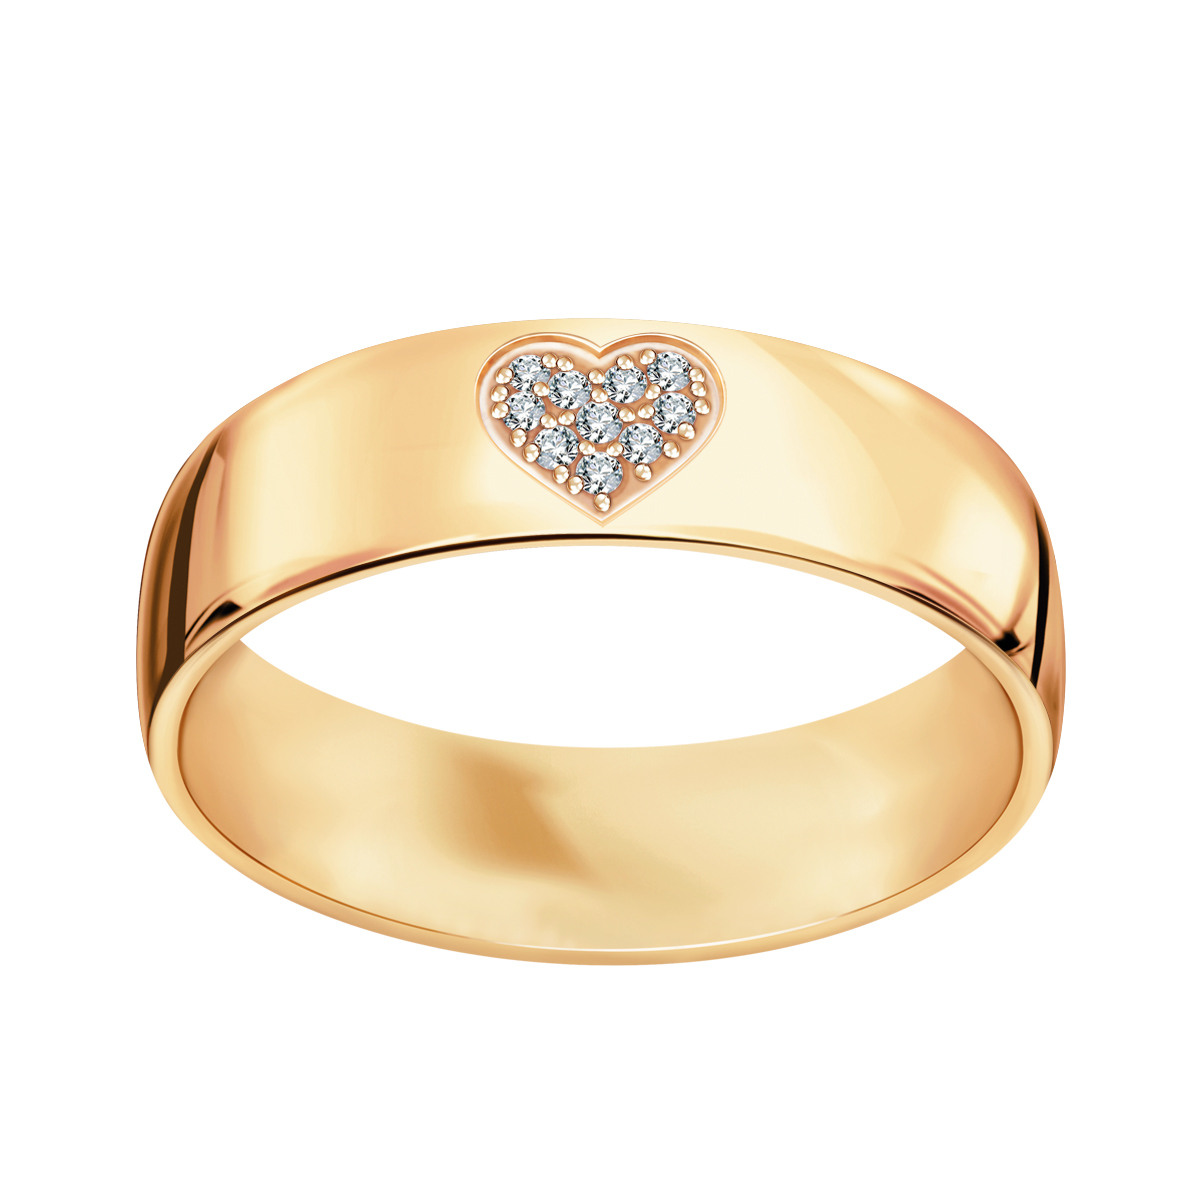 b2e02d1fff Złota obrączka z diamentami (151D - 34969)